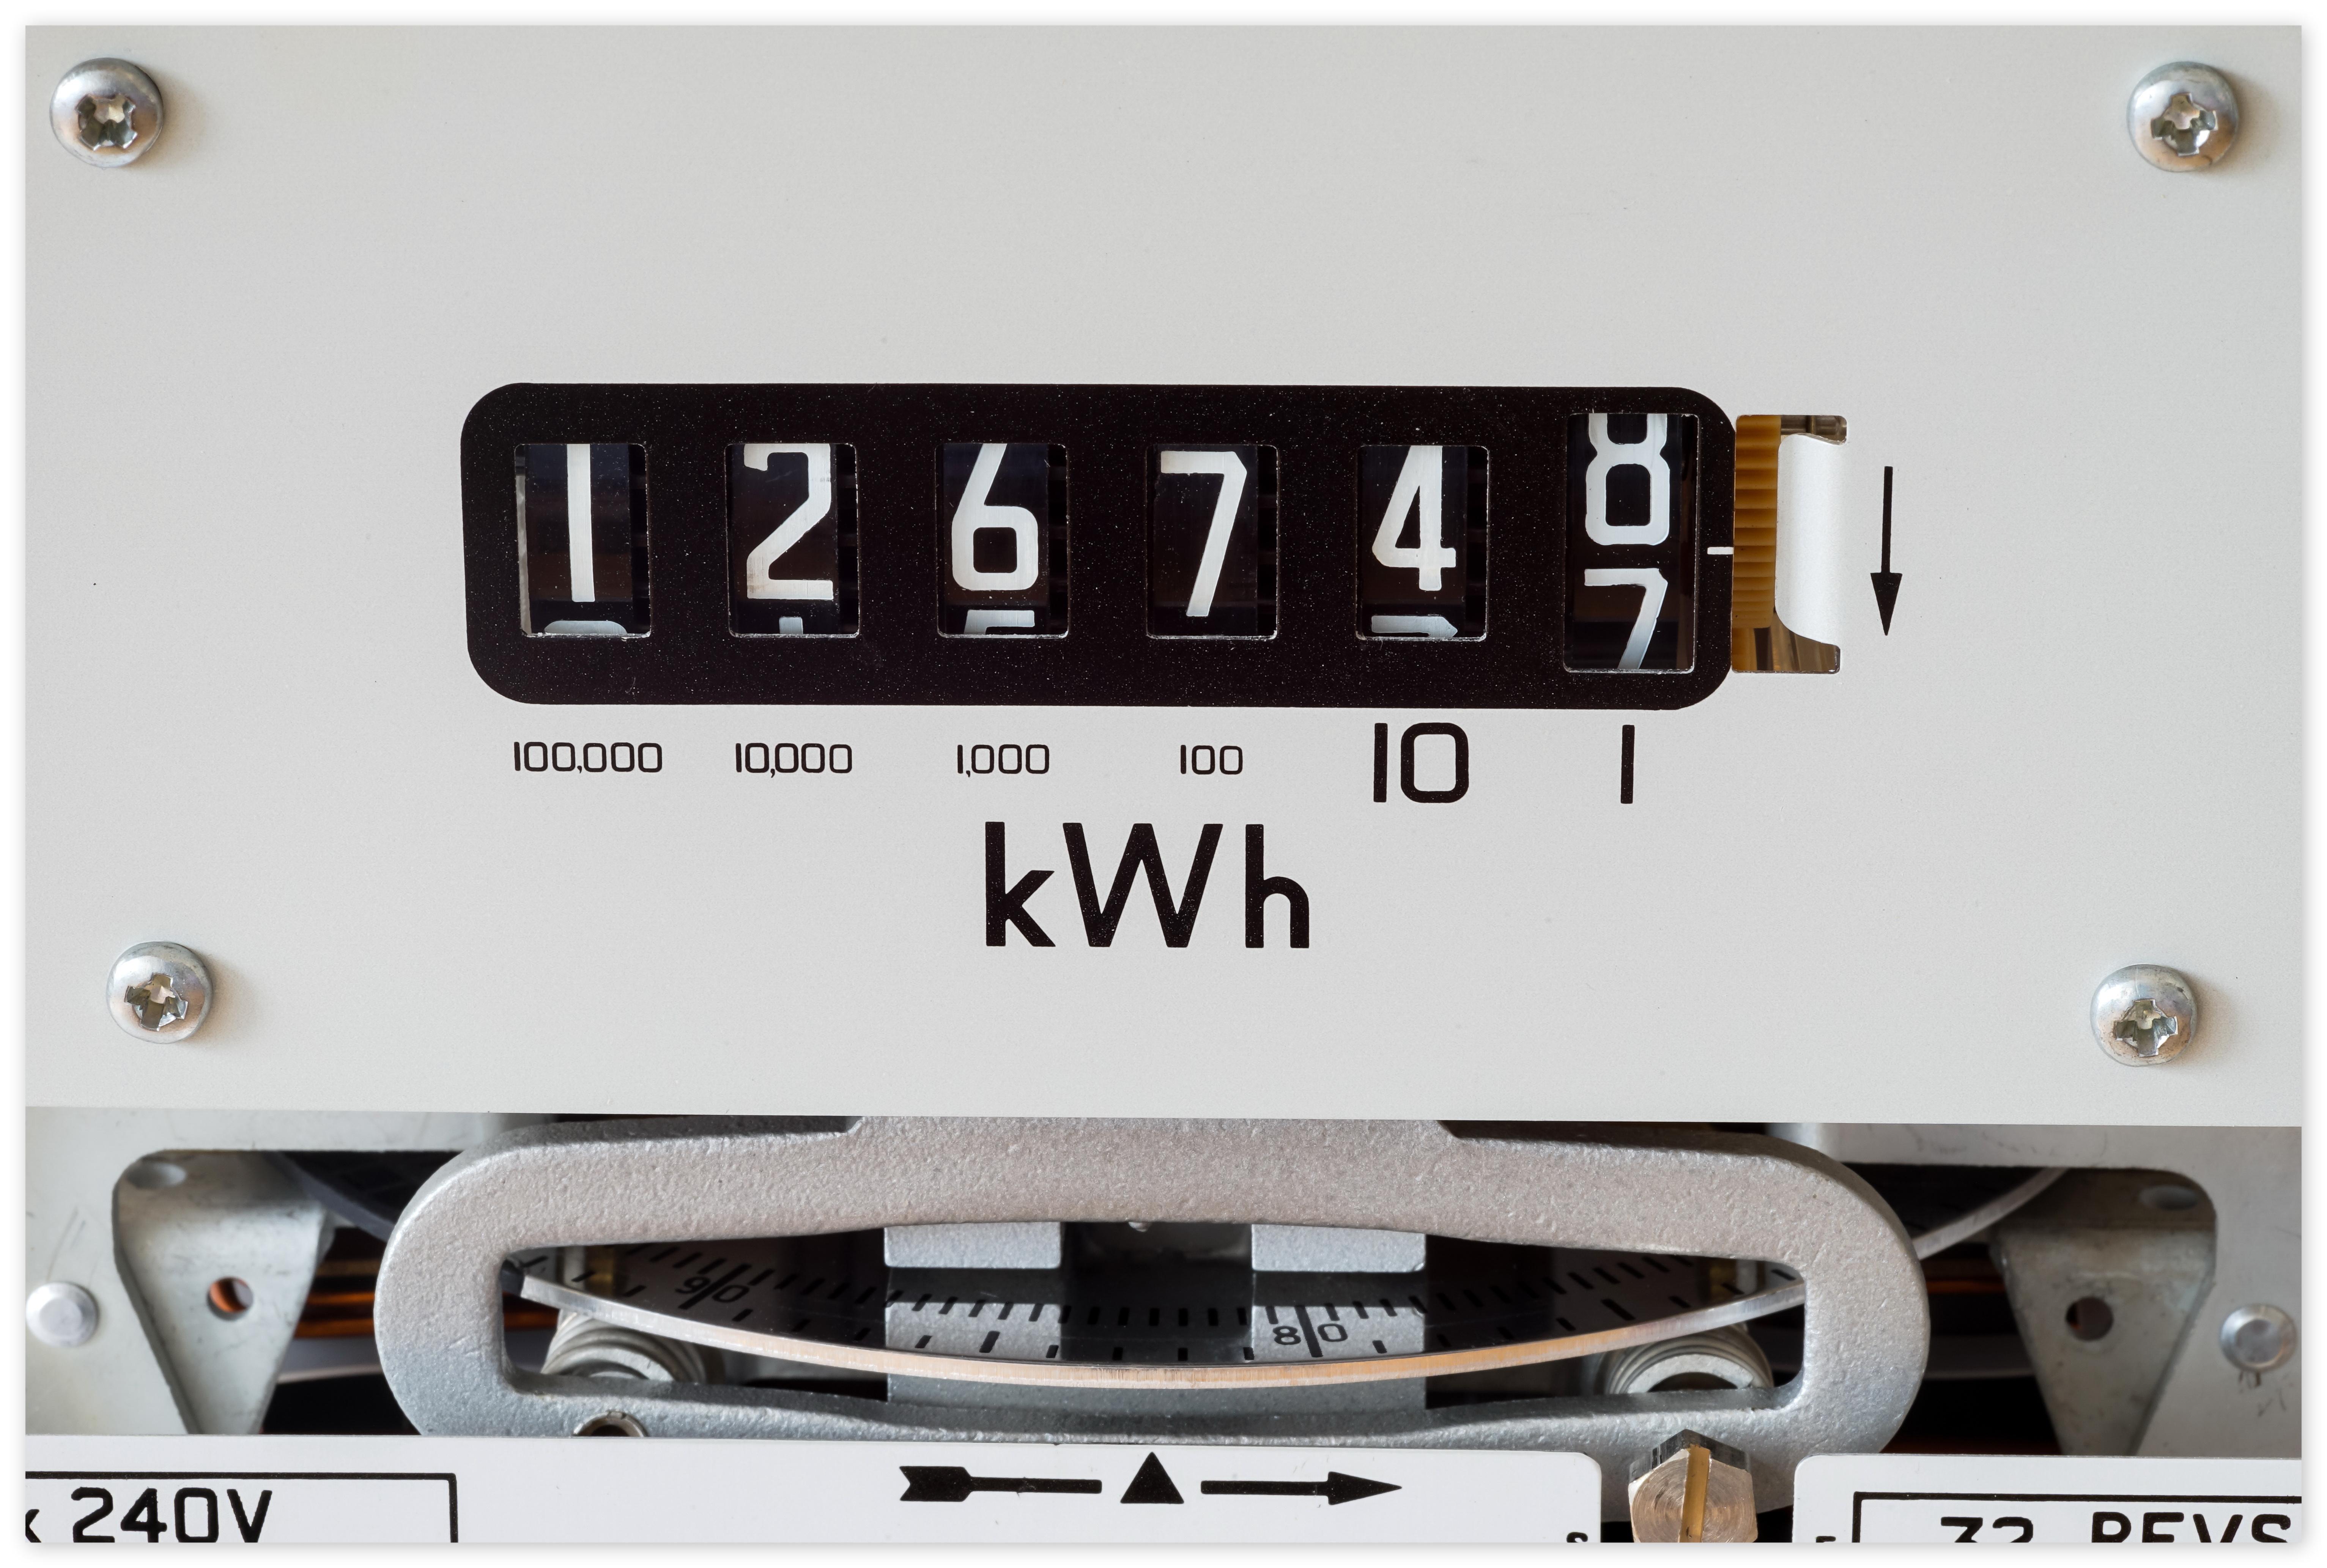 power consumption monitor